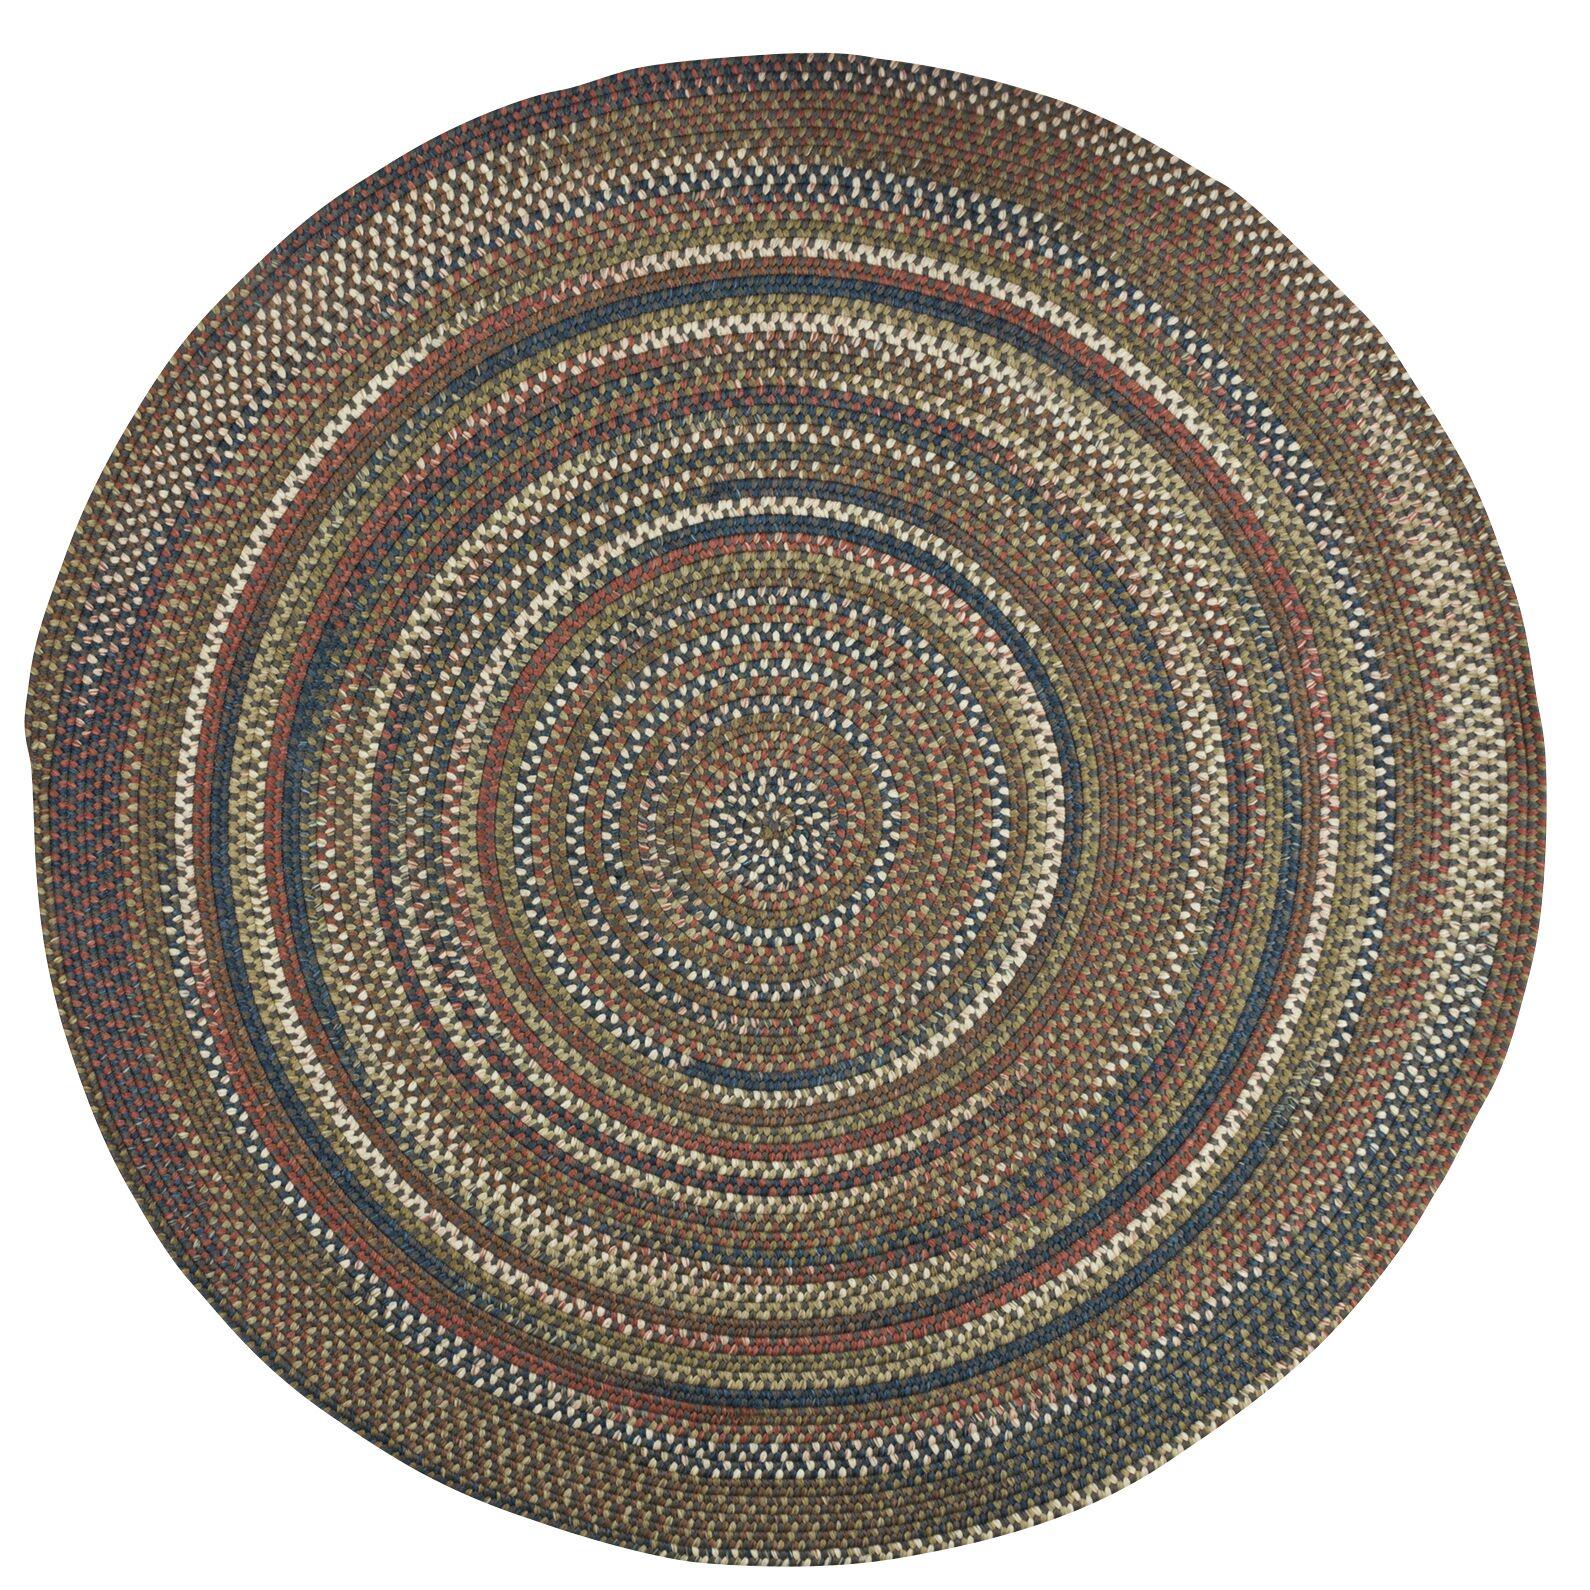 Kipton Gray Area Rug Rug Size: Round 12'